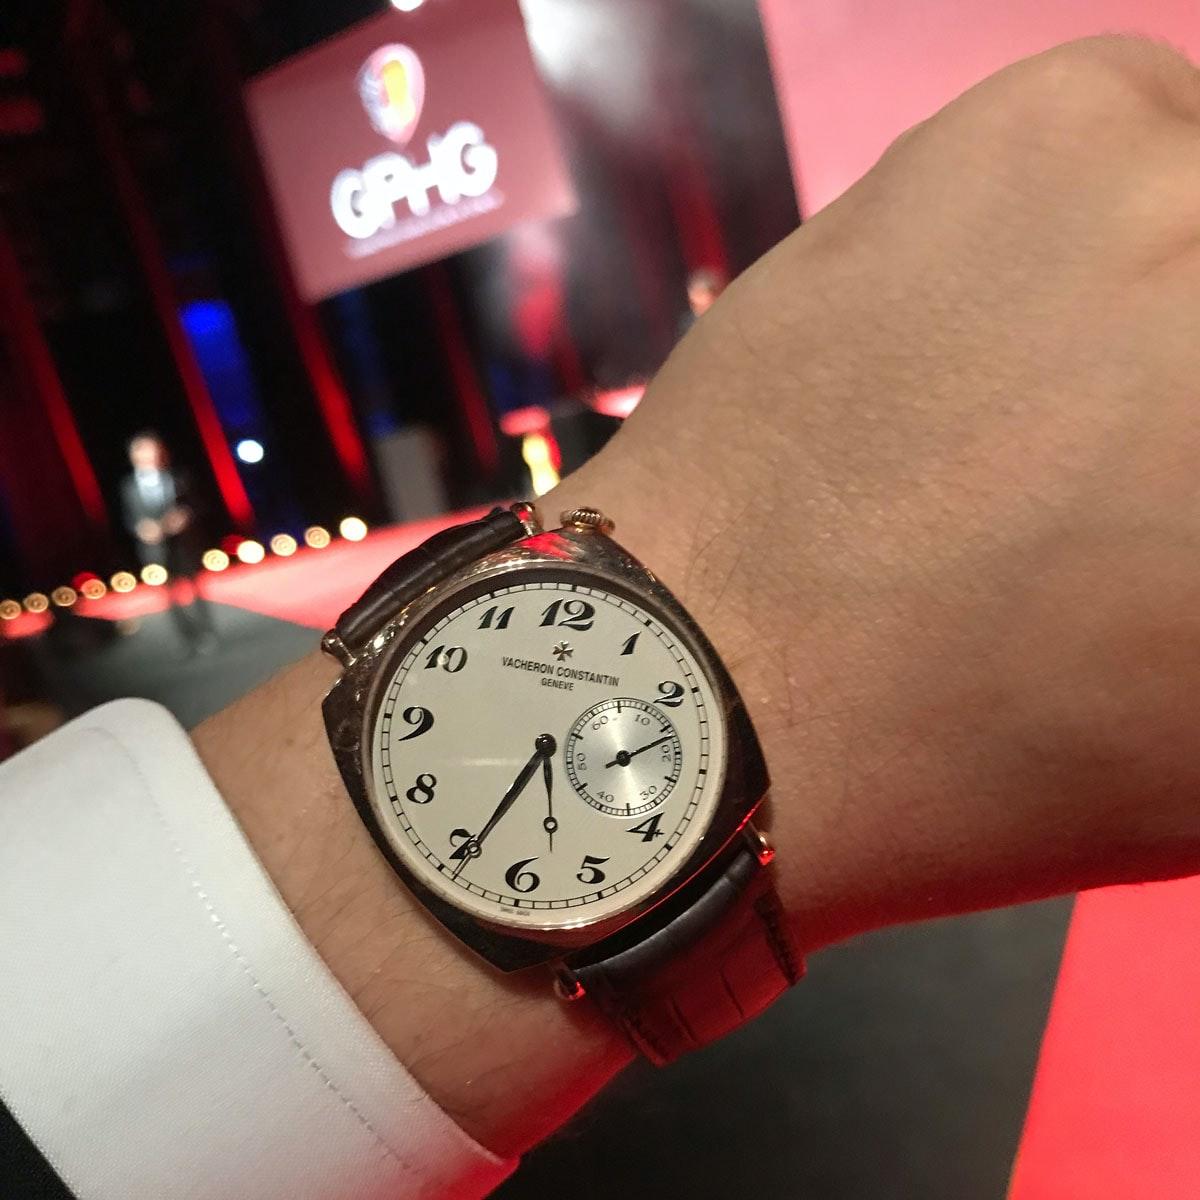 HODINKEE Radio: The 2018 Grand Prix d'Horlogerie de Genève vc